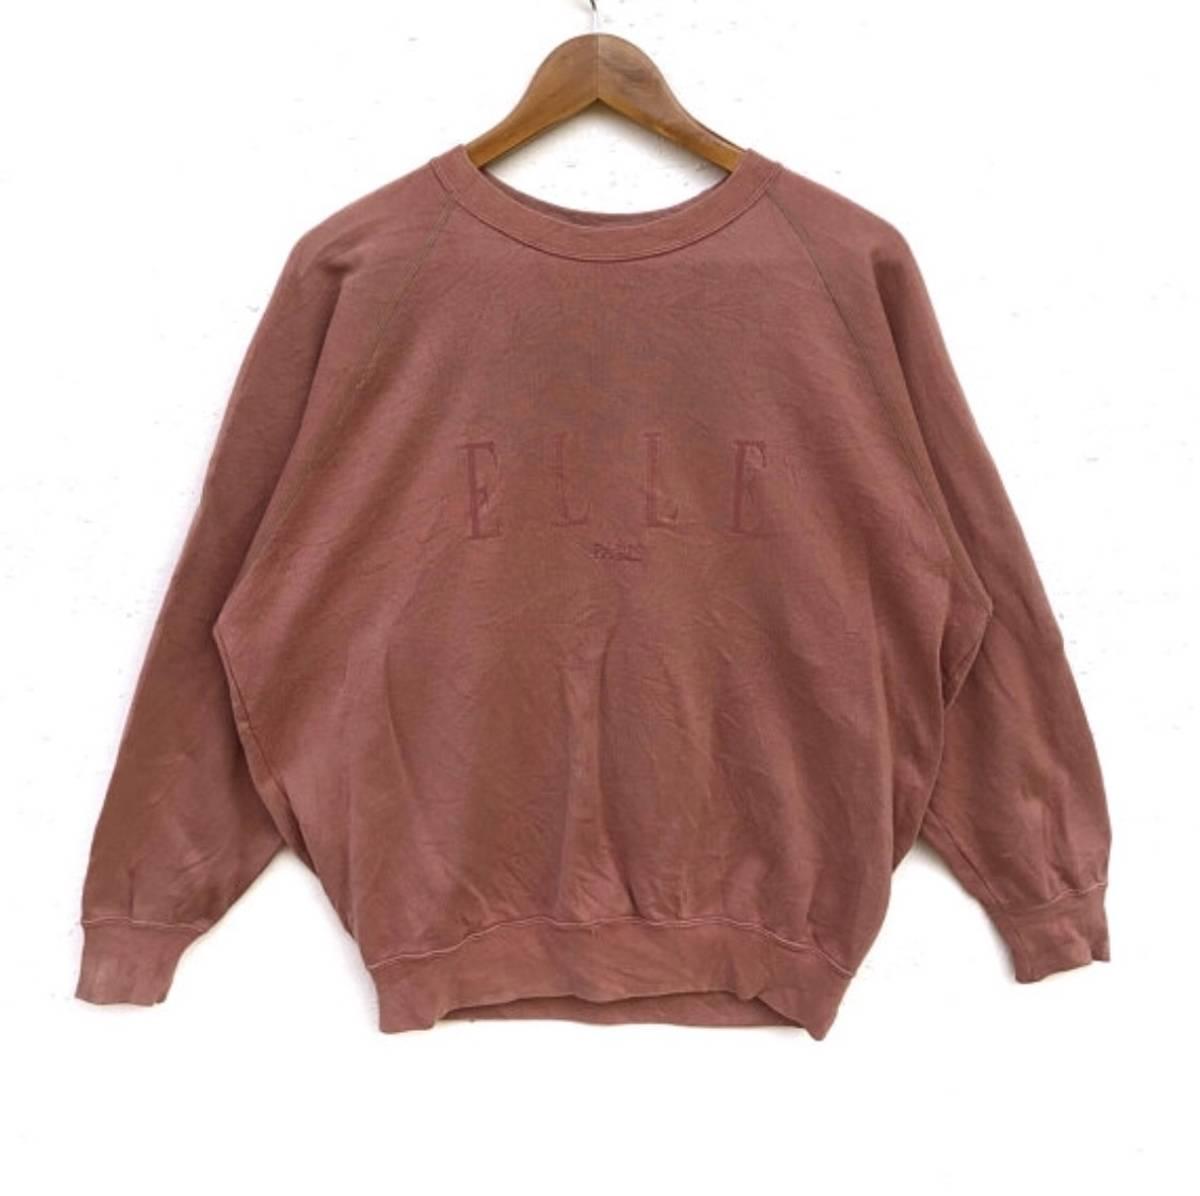 bfa9396fa2ed Vintage FINAL DROP‼️Elle paris Sweatshirt Big Logo spell out Embroidery  Sweat Medium Size Jumper Pullover Jacket Sweater 90 s Size l - Sweatshirts  ...